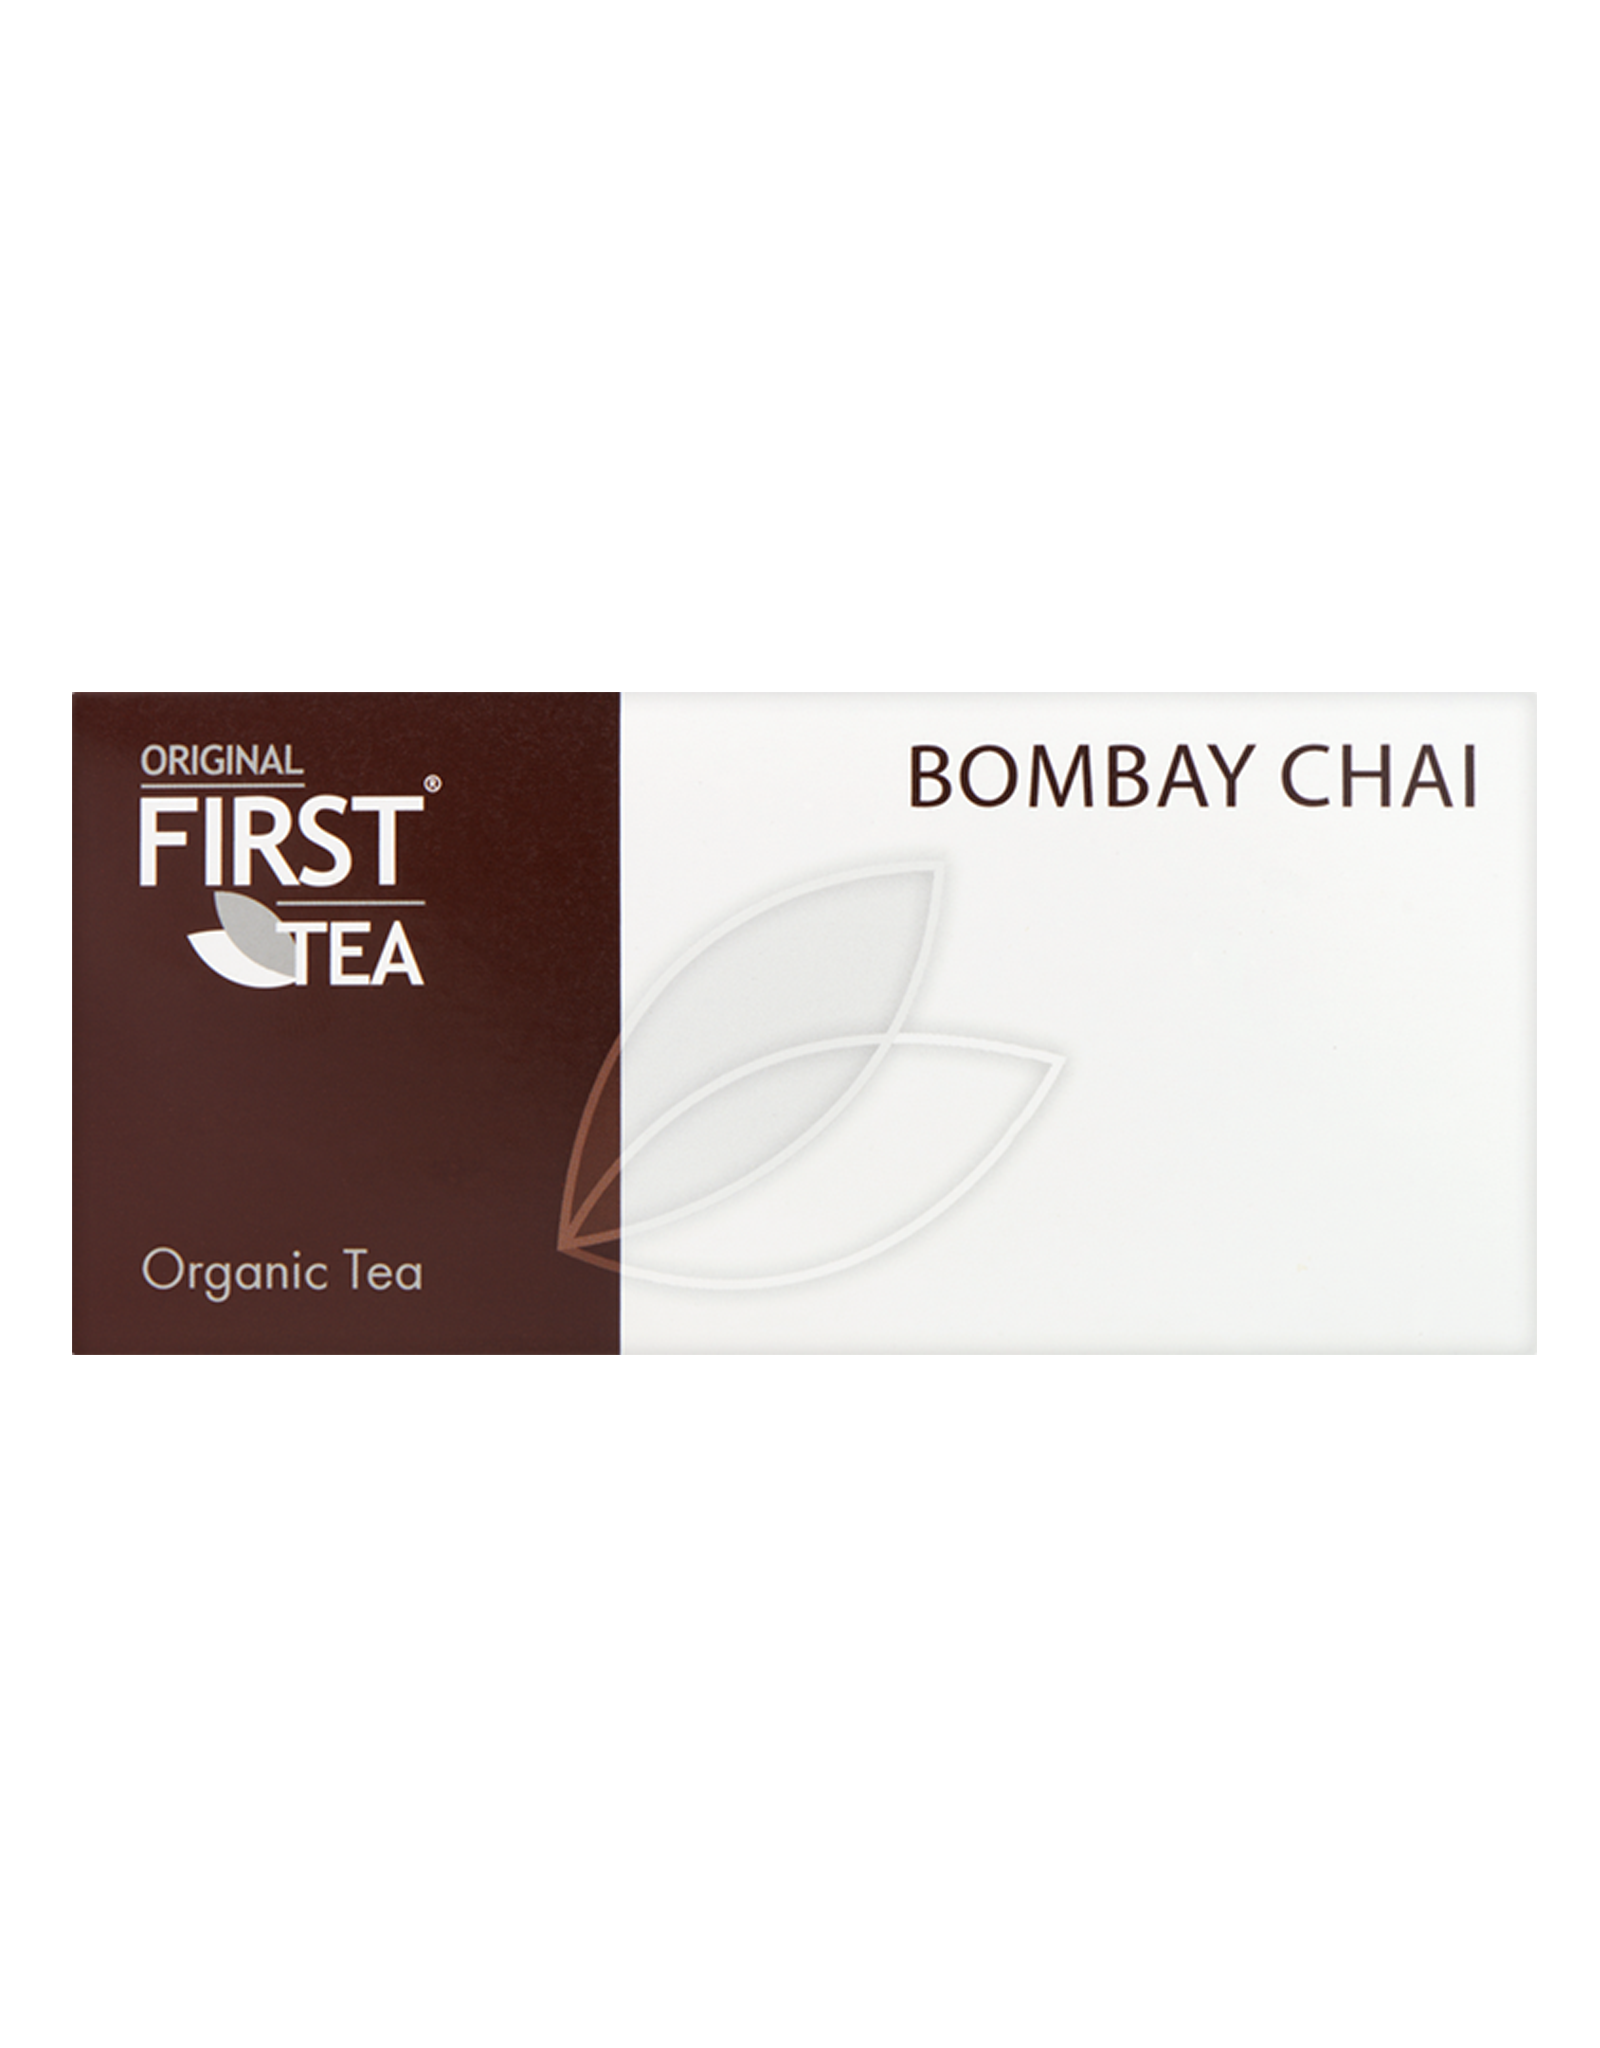 First Tea Master line Masterline Bombay Chai